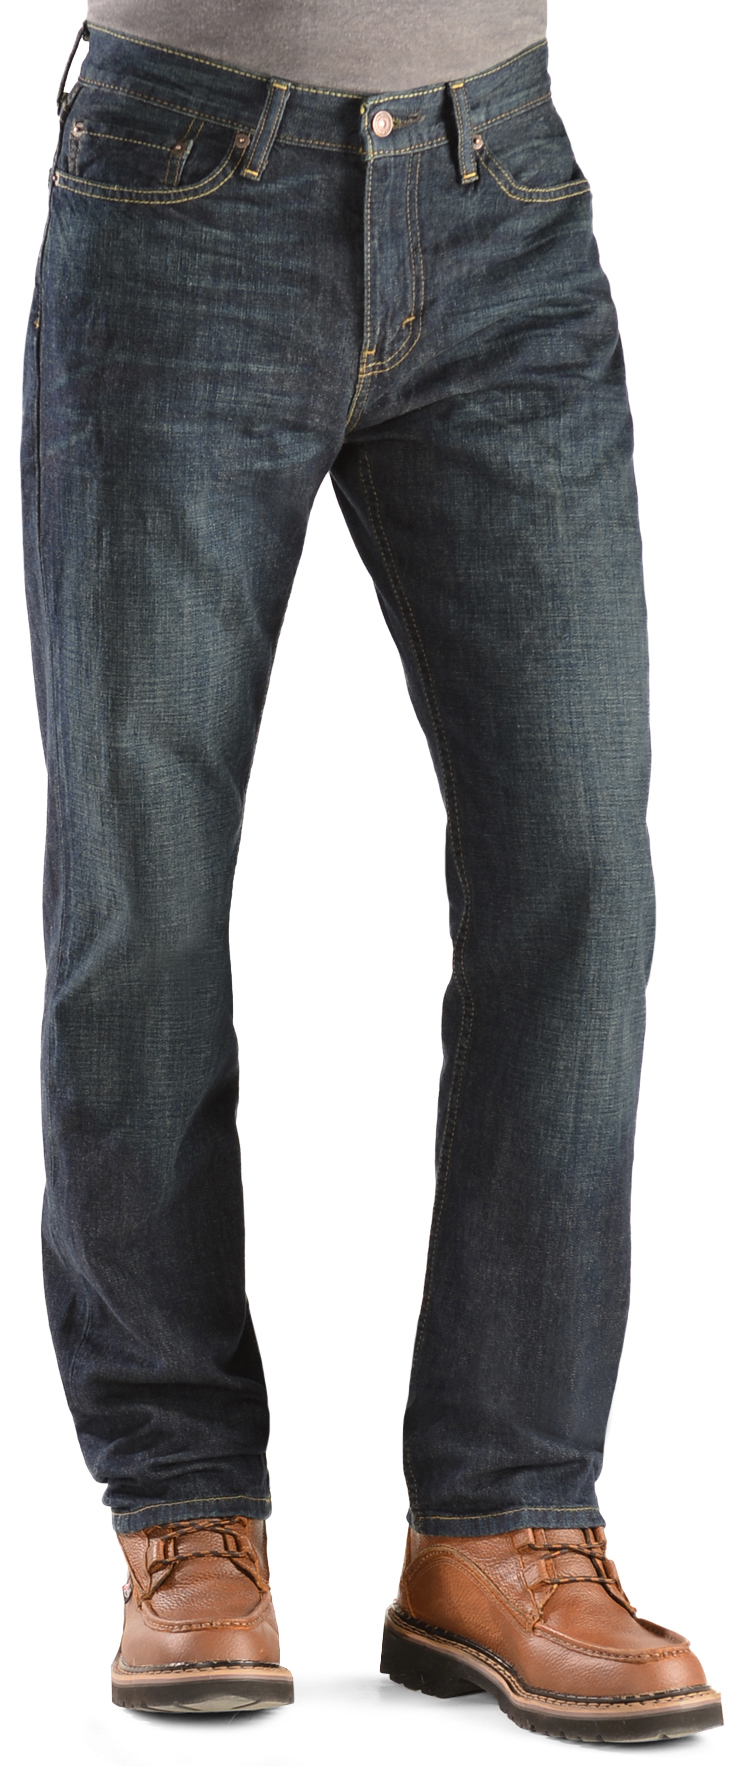 Levi's 514 slim straight jeans sale